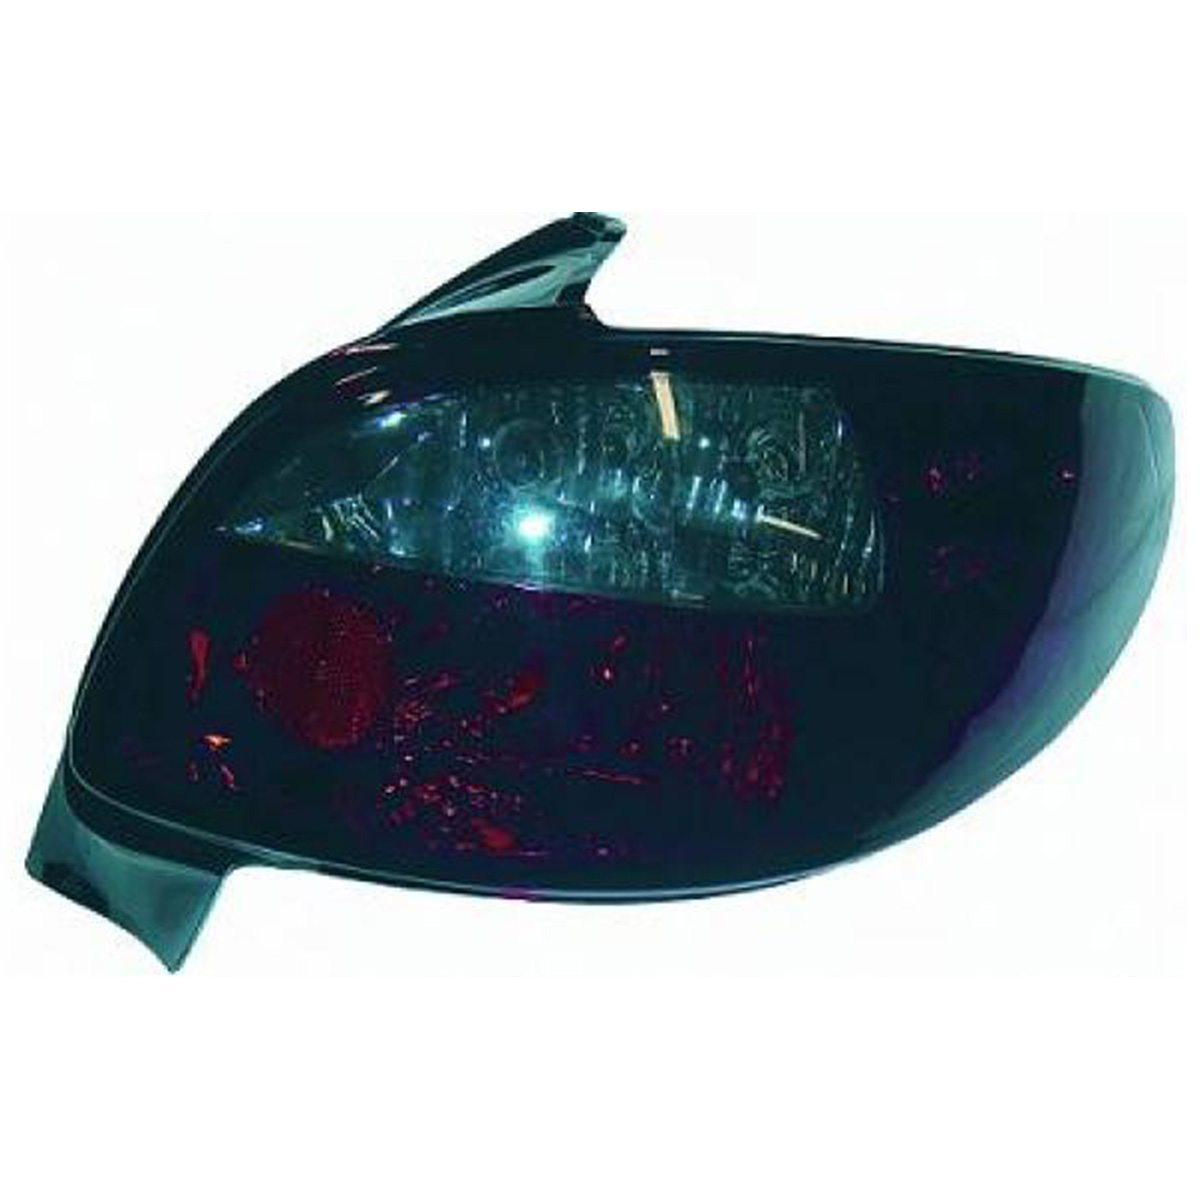 Peugeot-206-98-08-–-Farolins-Cristal-Escurecidos